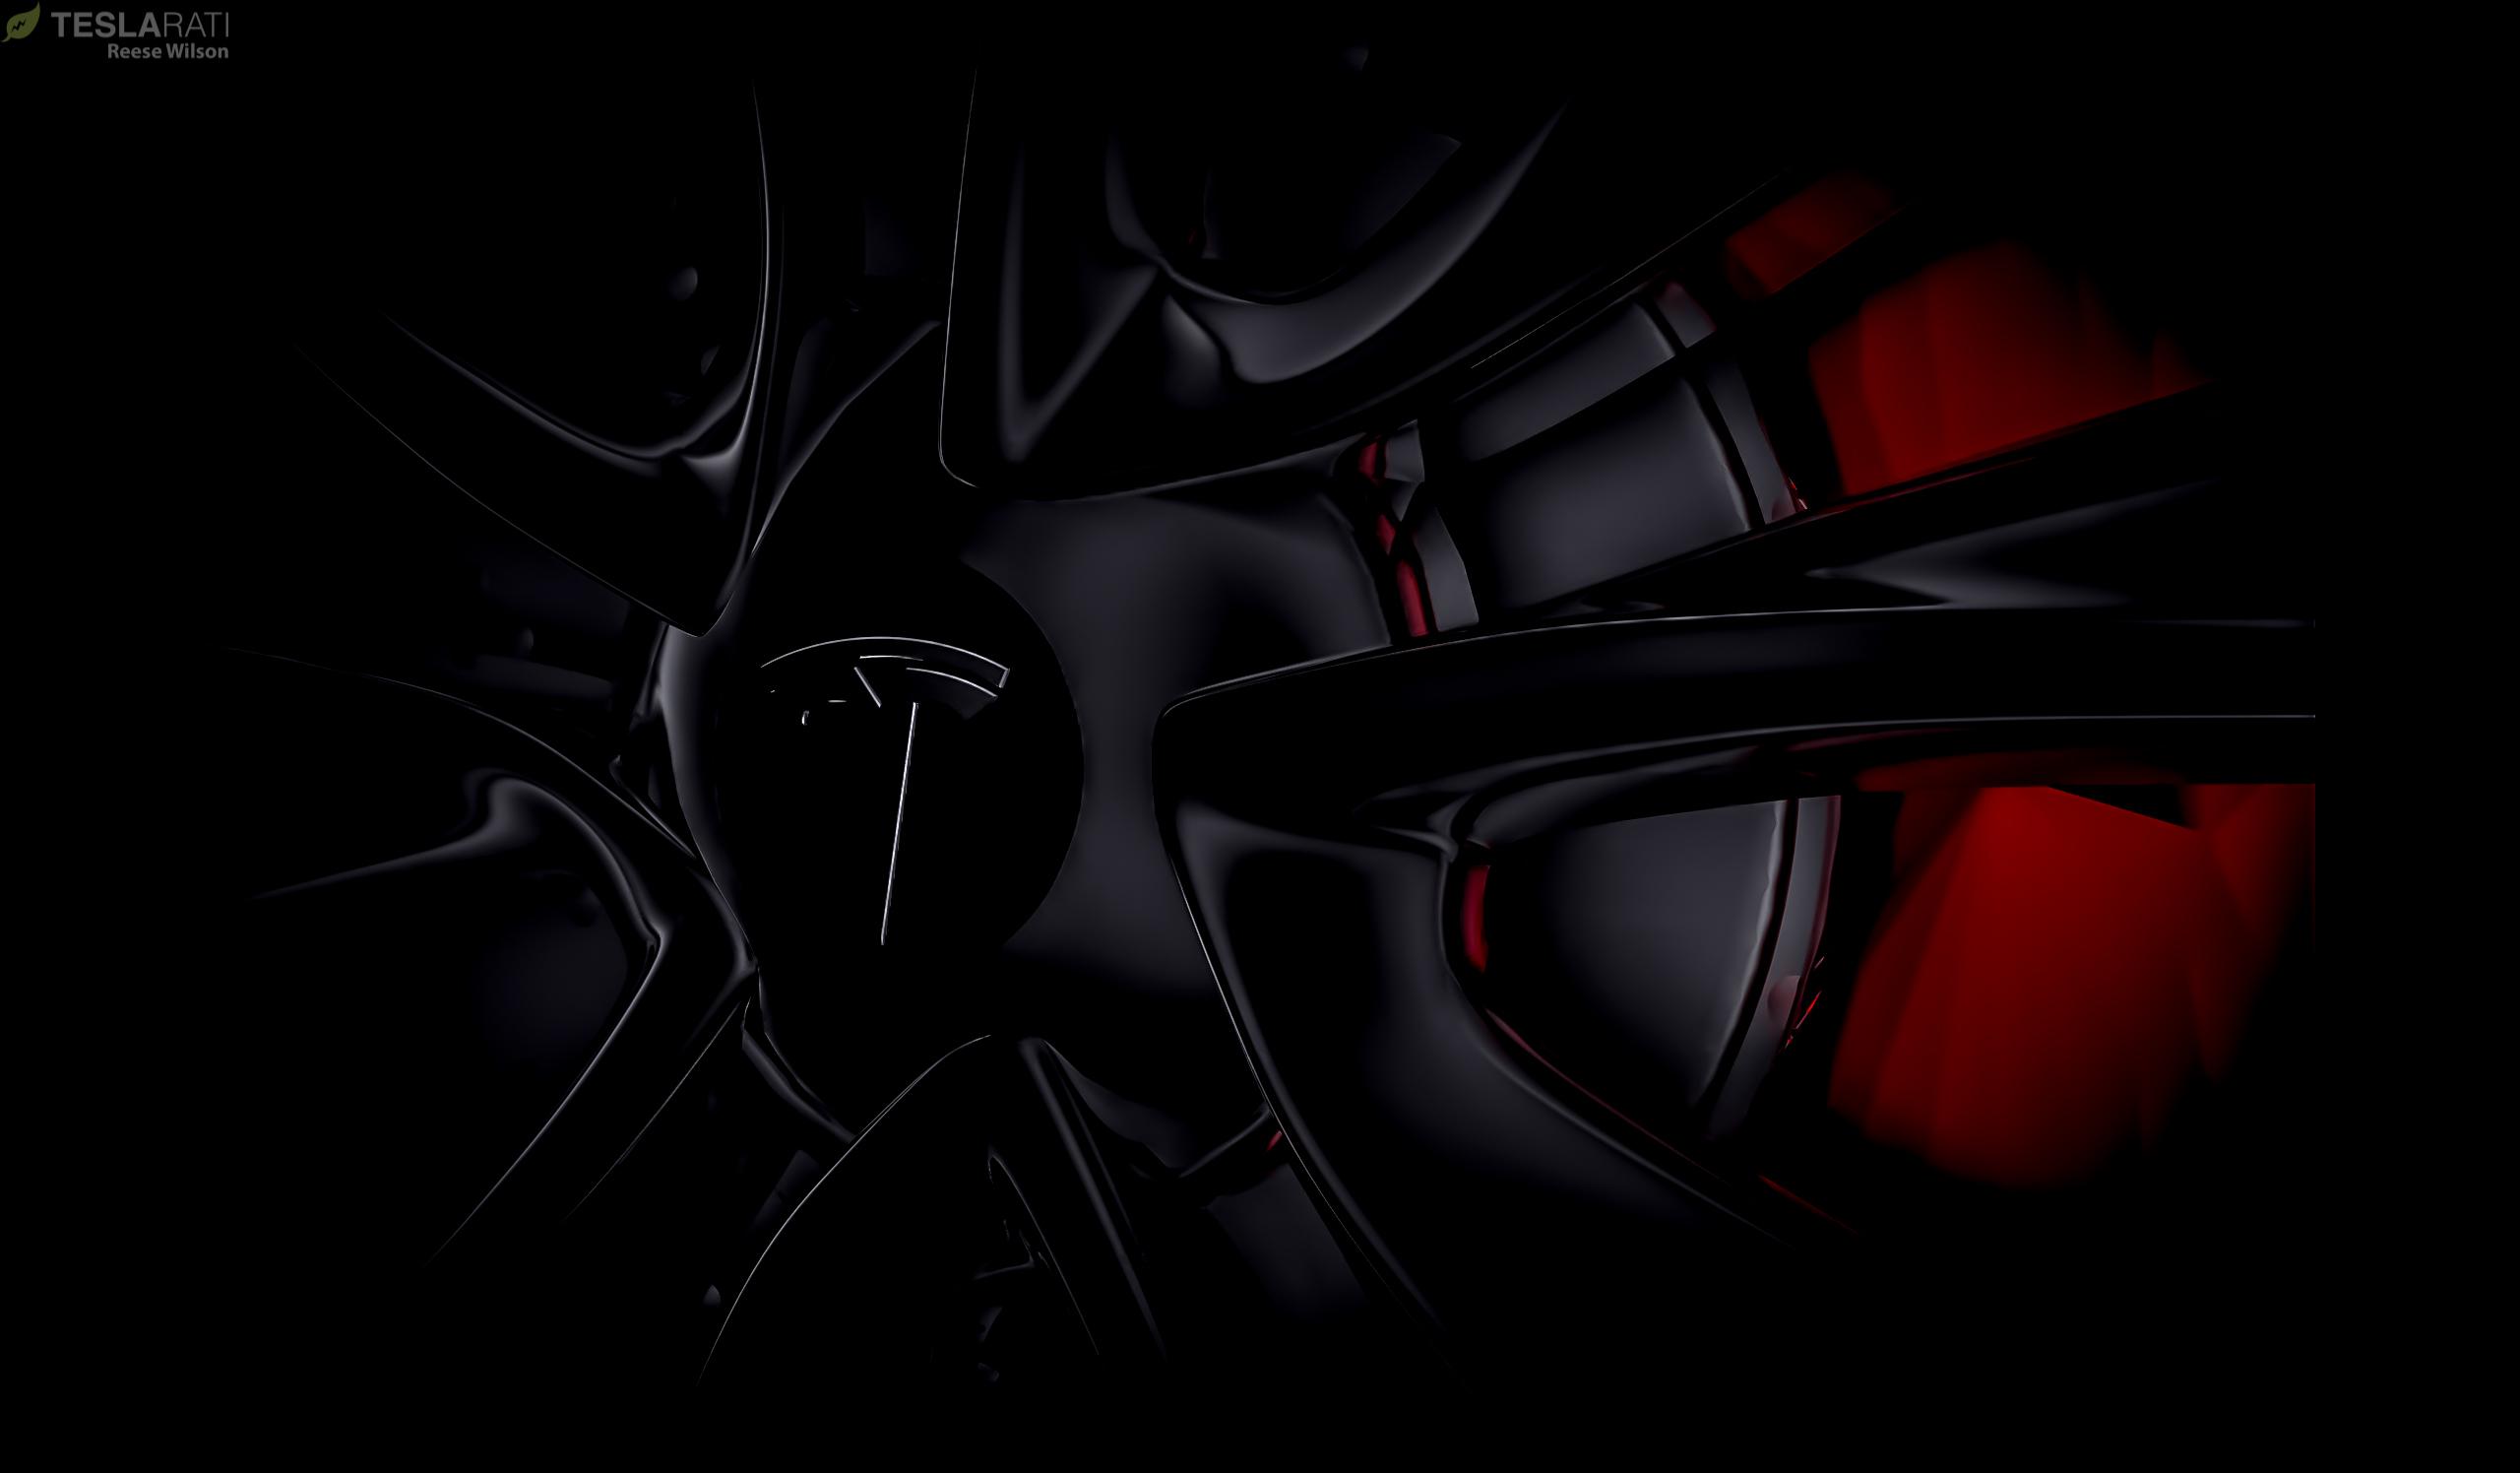 tesla-roadster-brakes